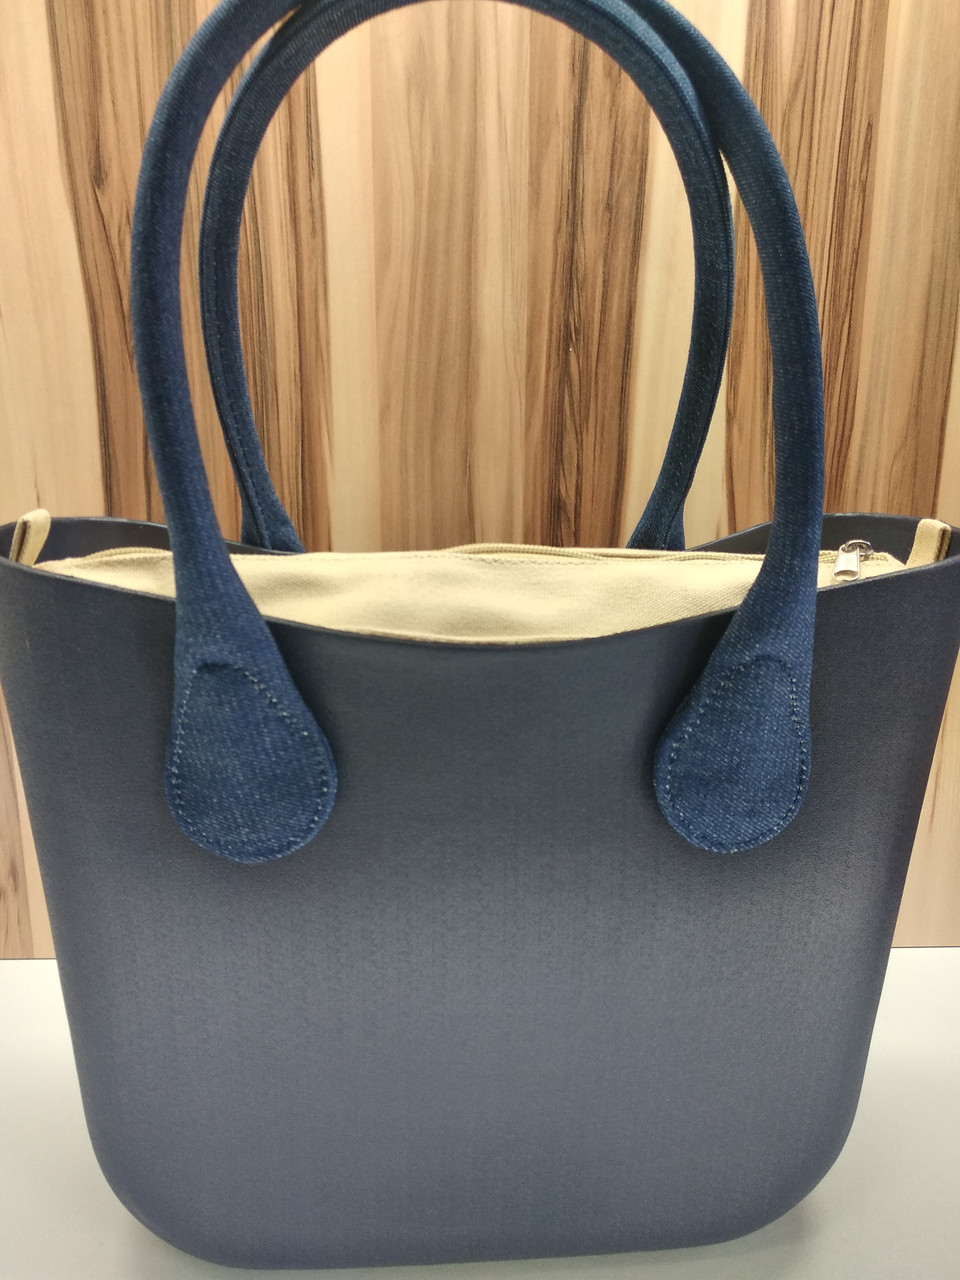 577fd2156e00 Сумка IQ bag Mini синий, цена 990 грн., купить Дніпро — Prom.ua (ID ...